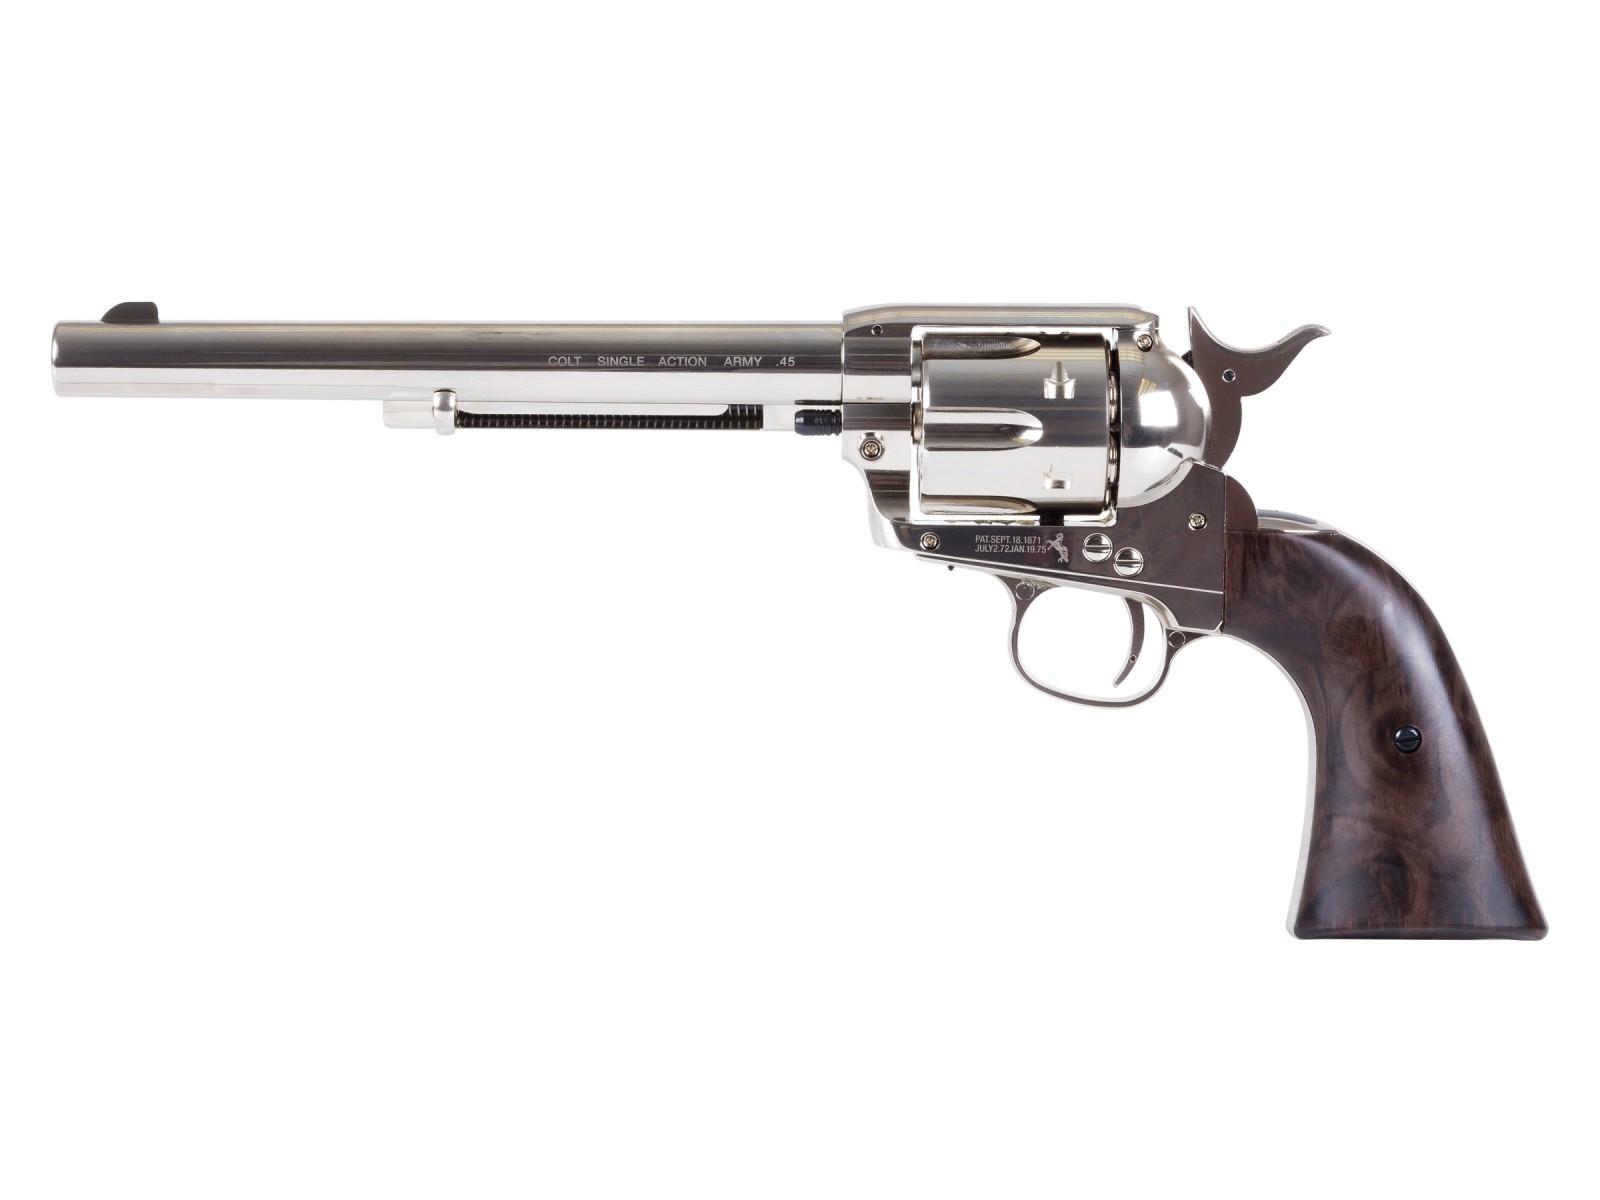 "Colt SAA Peacemaker 7.5"" CO2 Pellet Revolver, Nickel"